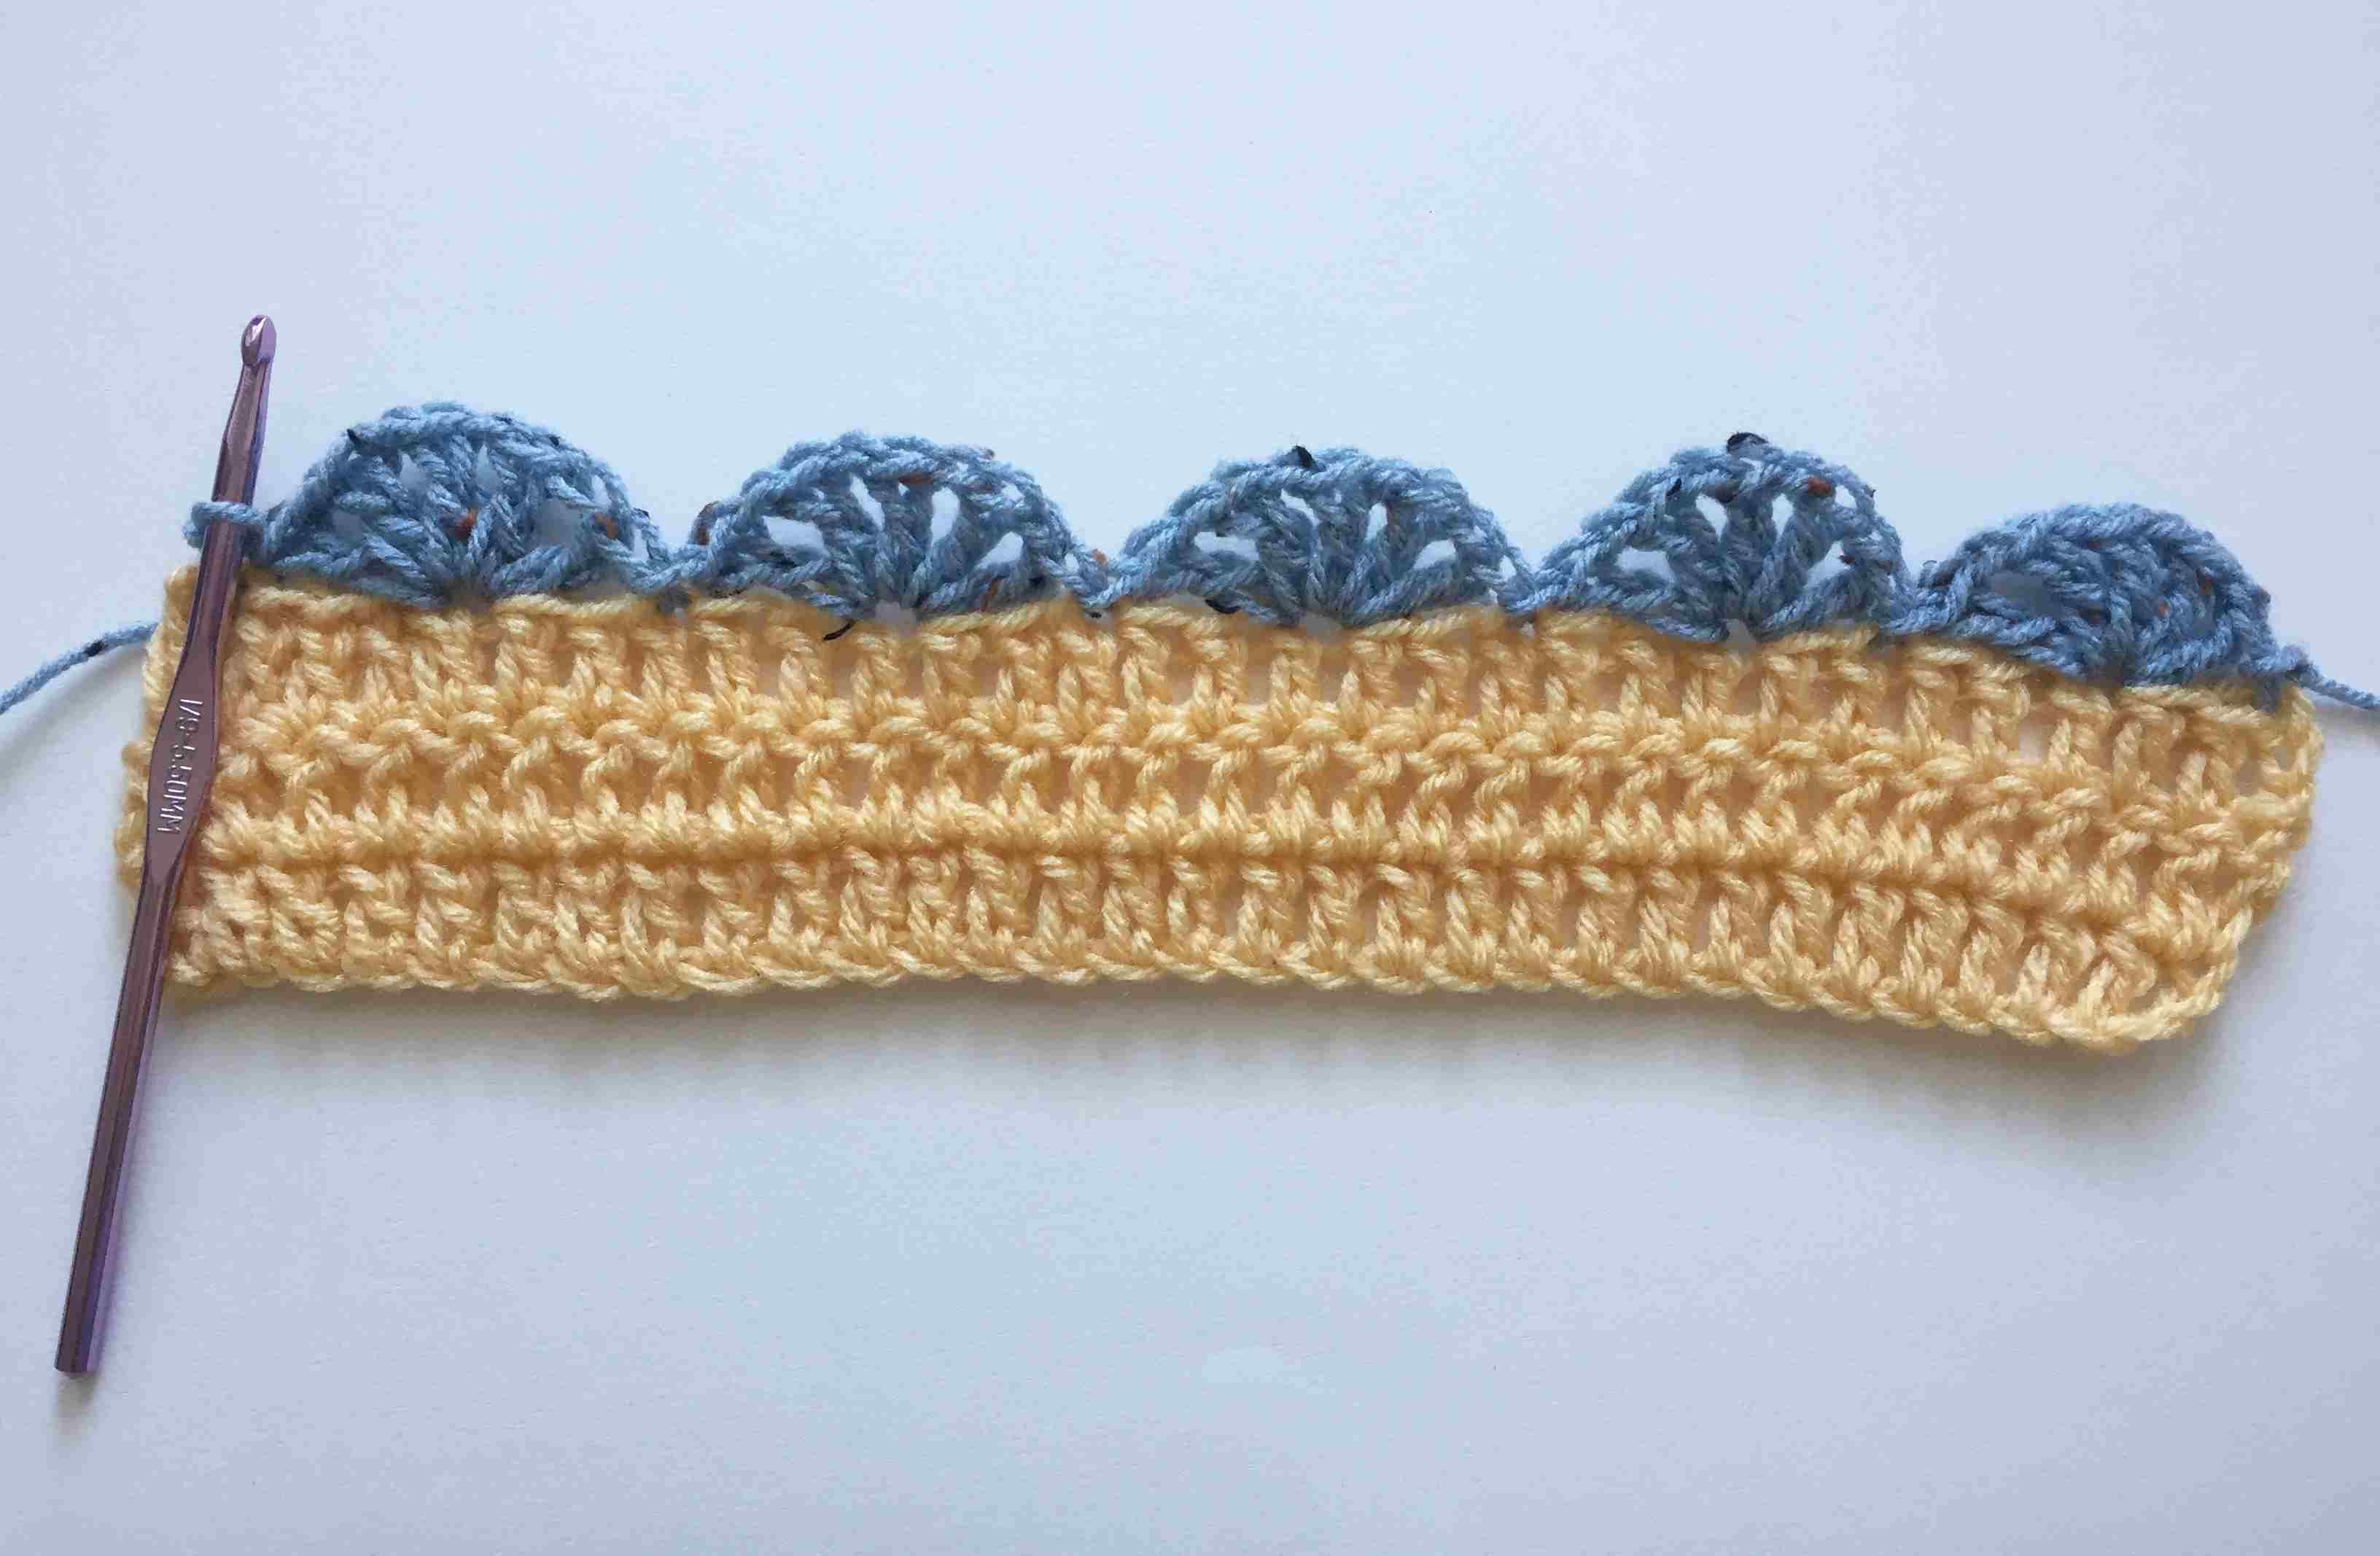 Simple Shell Stitch Crochet Edging Pattern